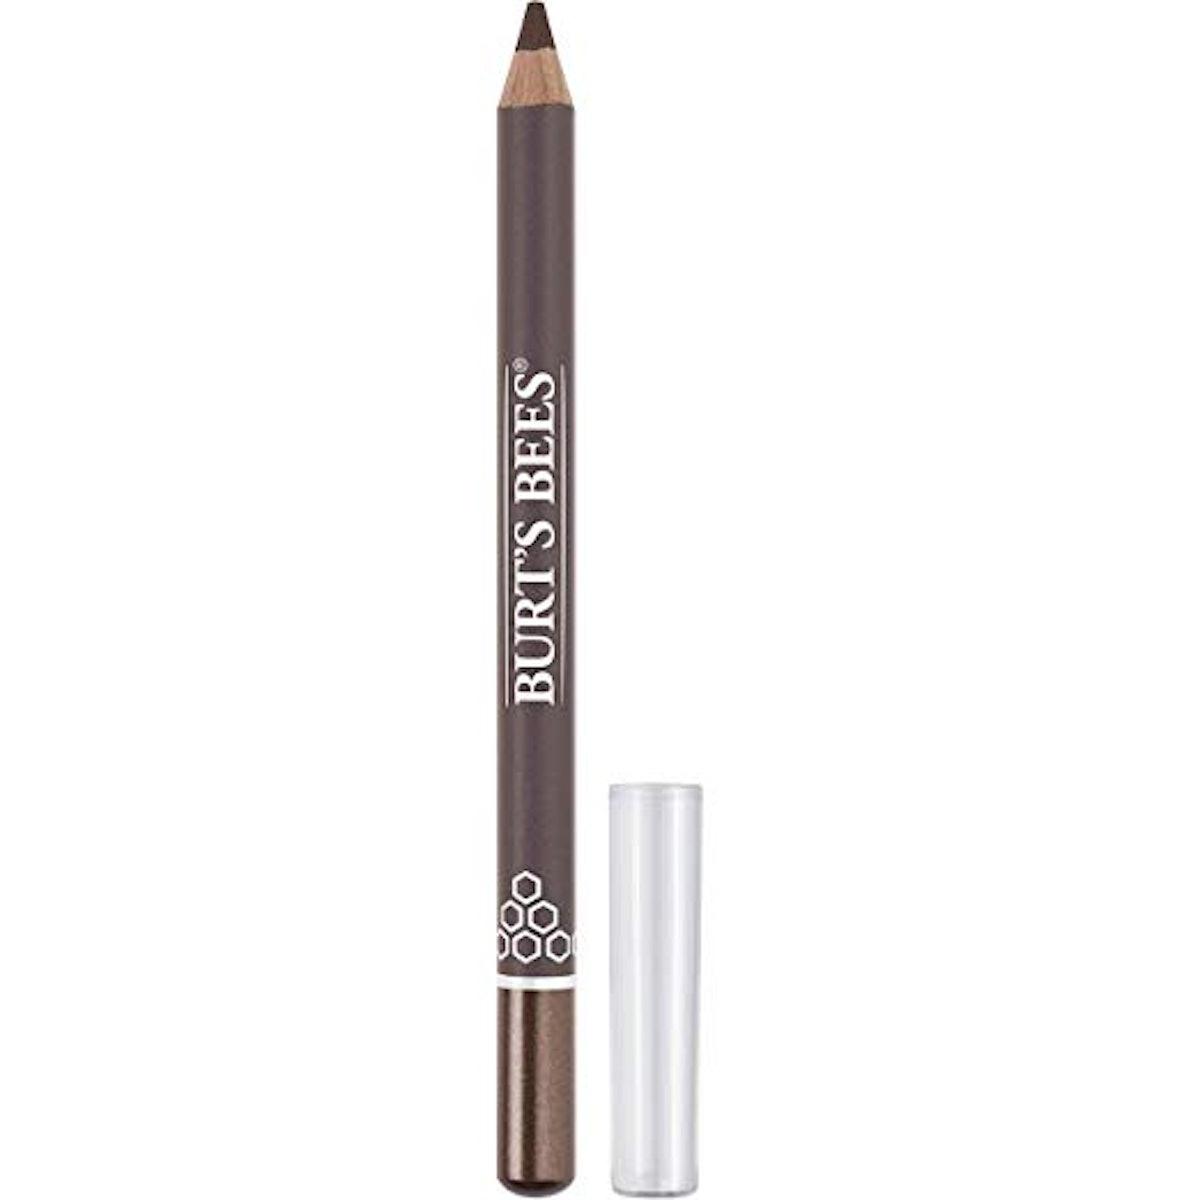 Burt's Bees Nourishing Eyeliner Pencil